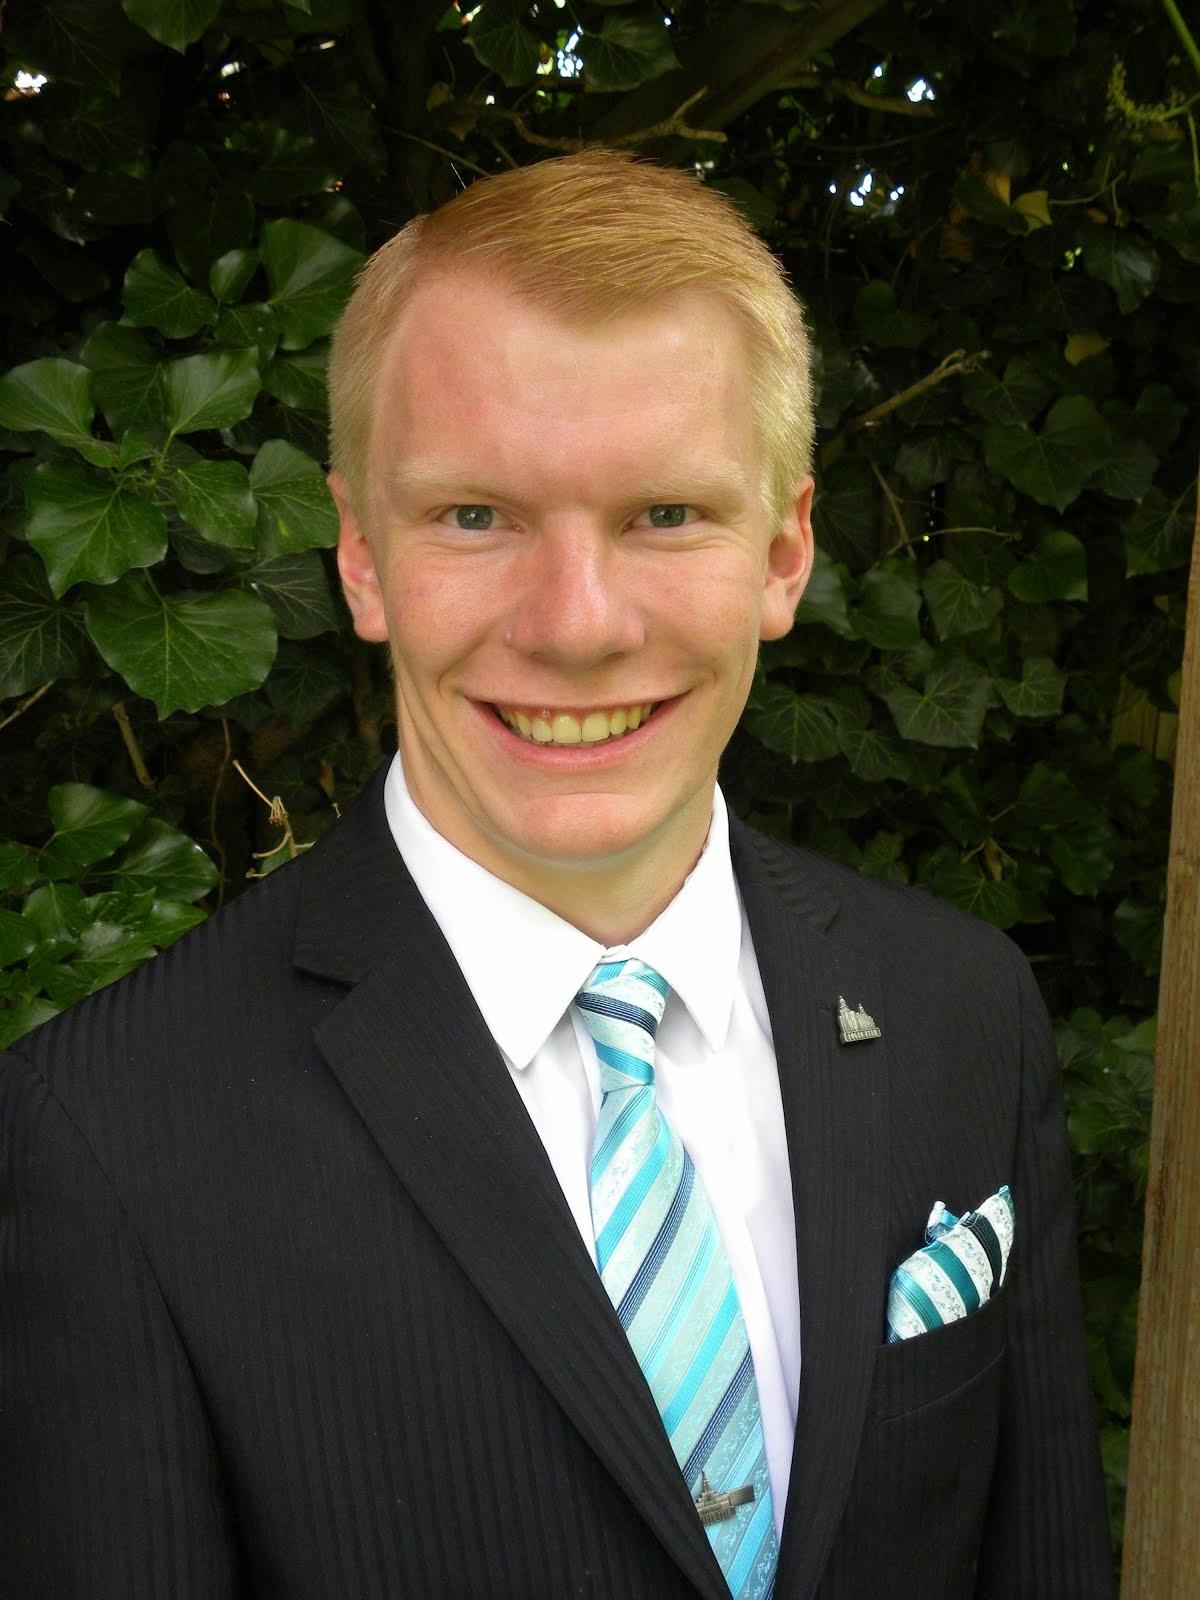 Elder Logan Joseph Draper